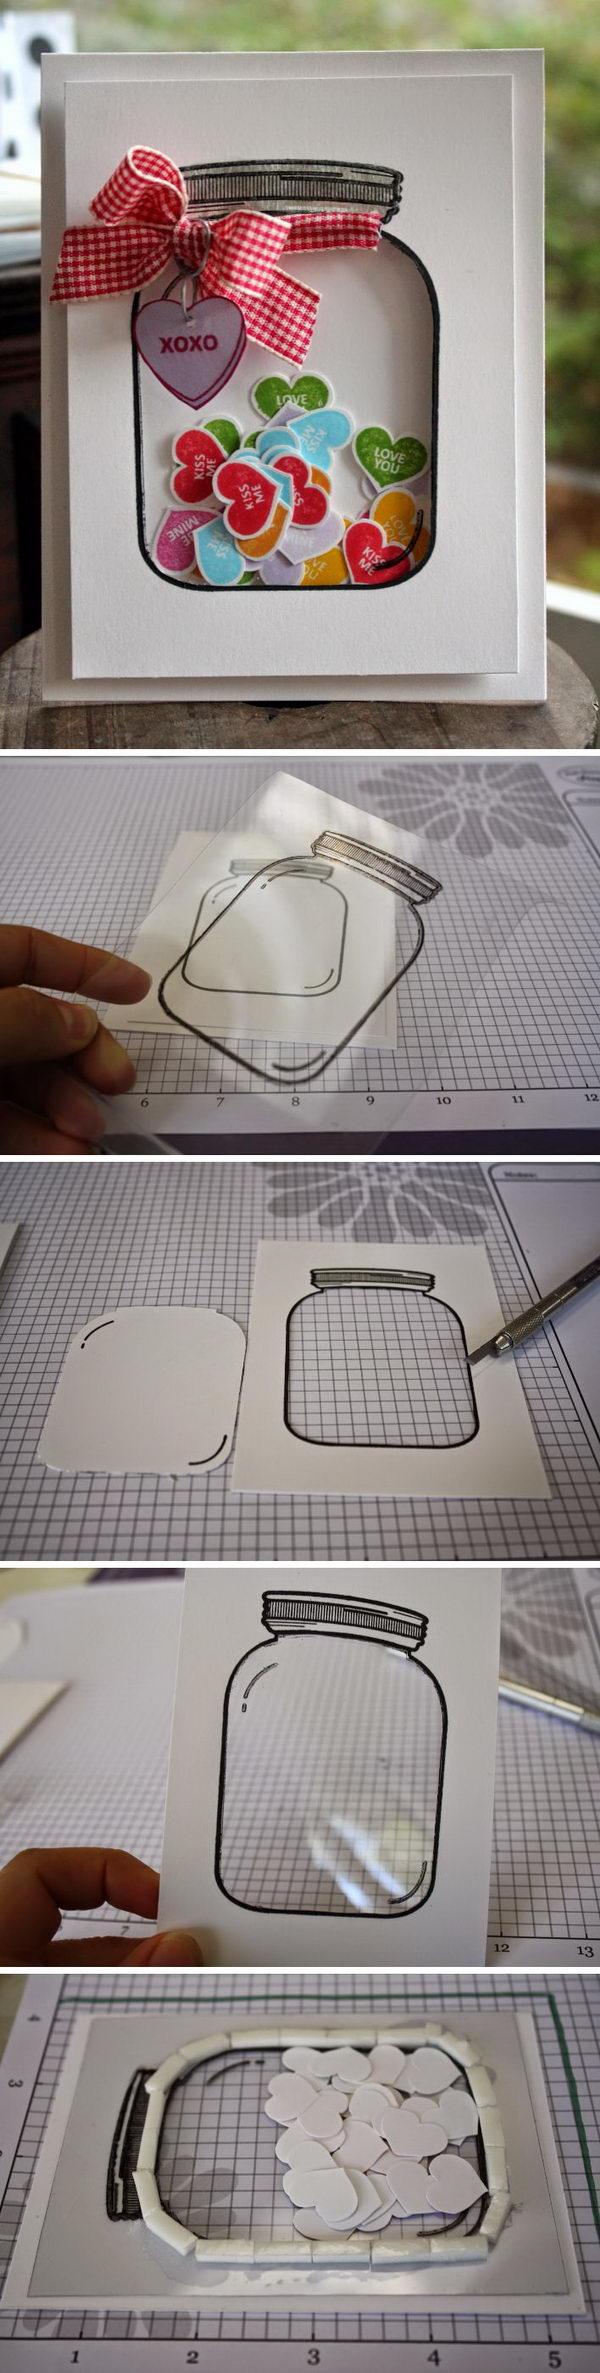 Tarjeta artesanal